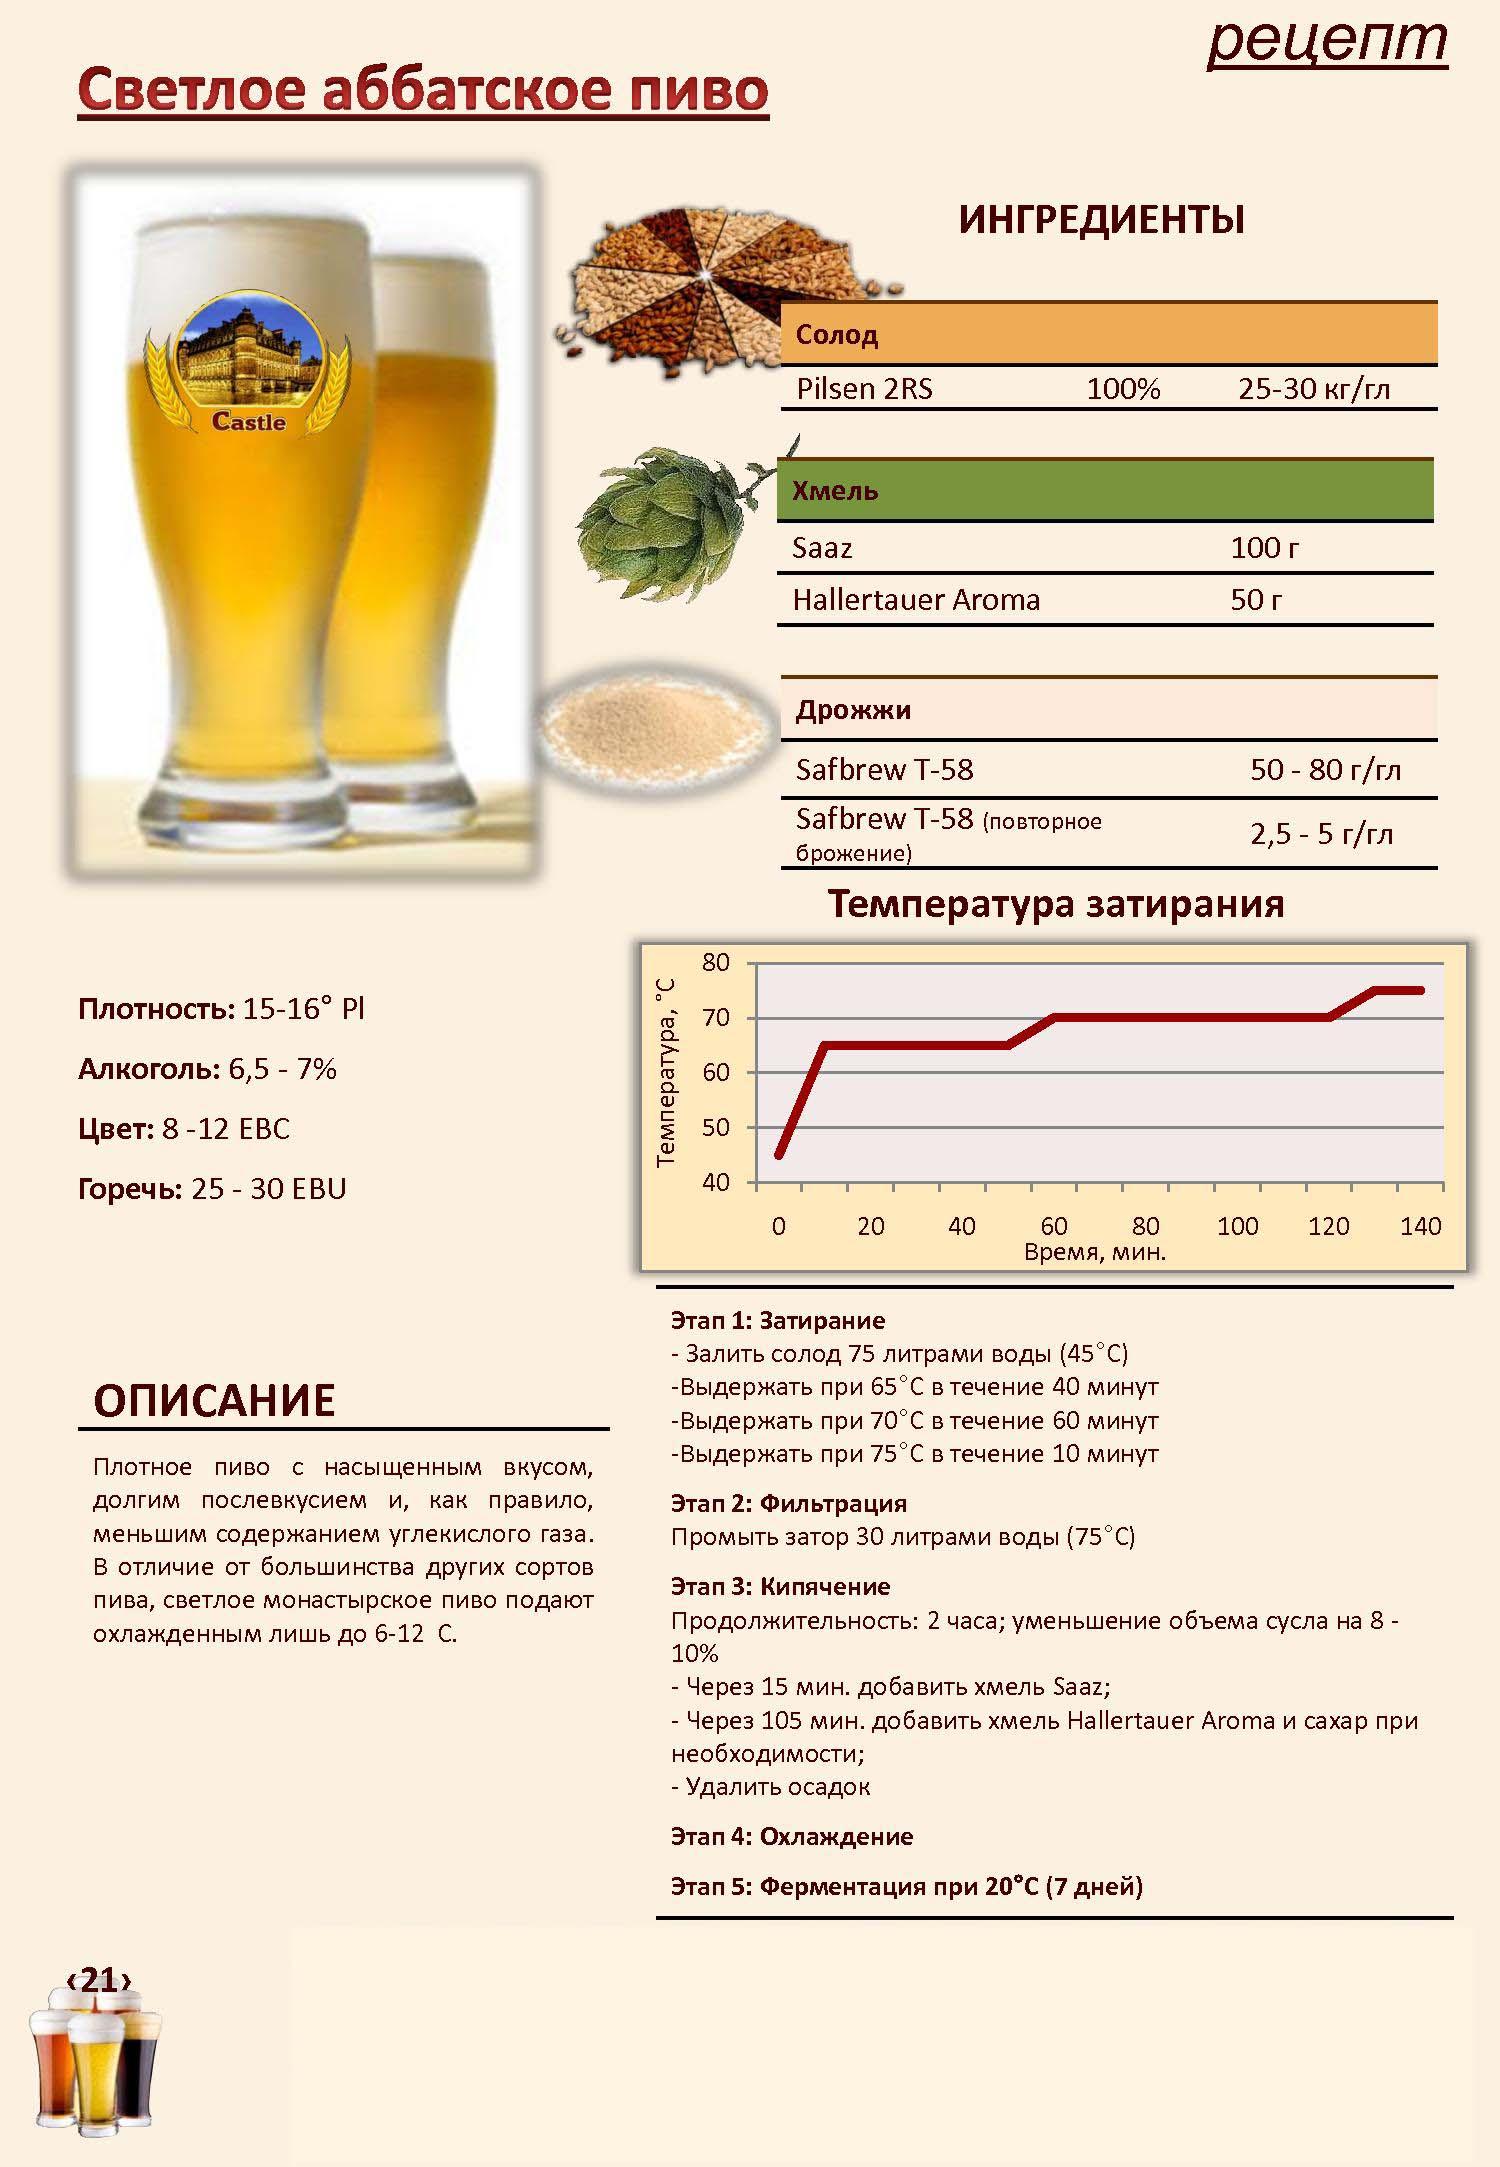 Рецепт пива в домашних условиях из солода